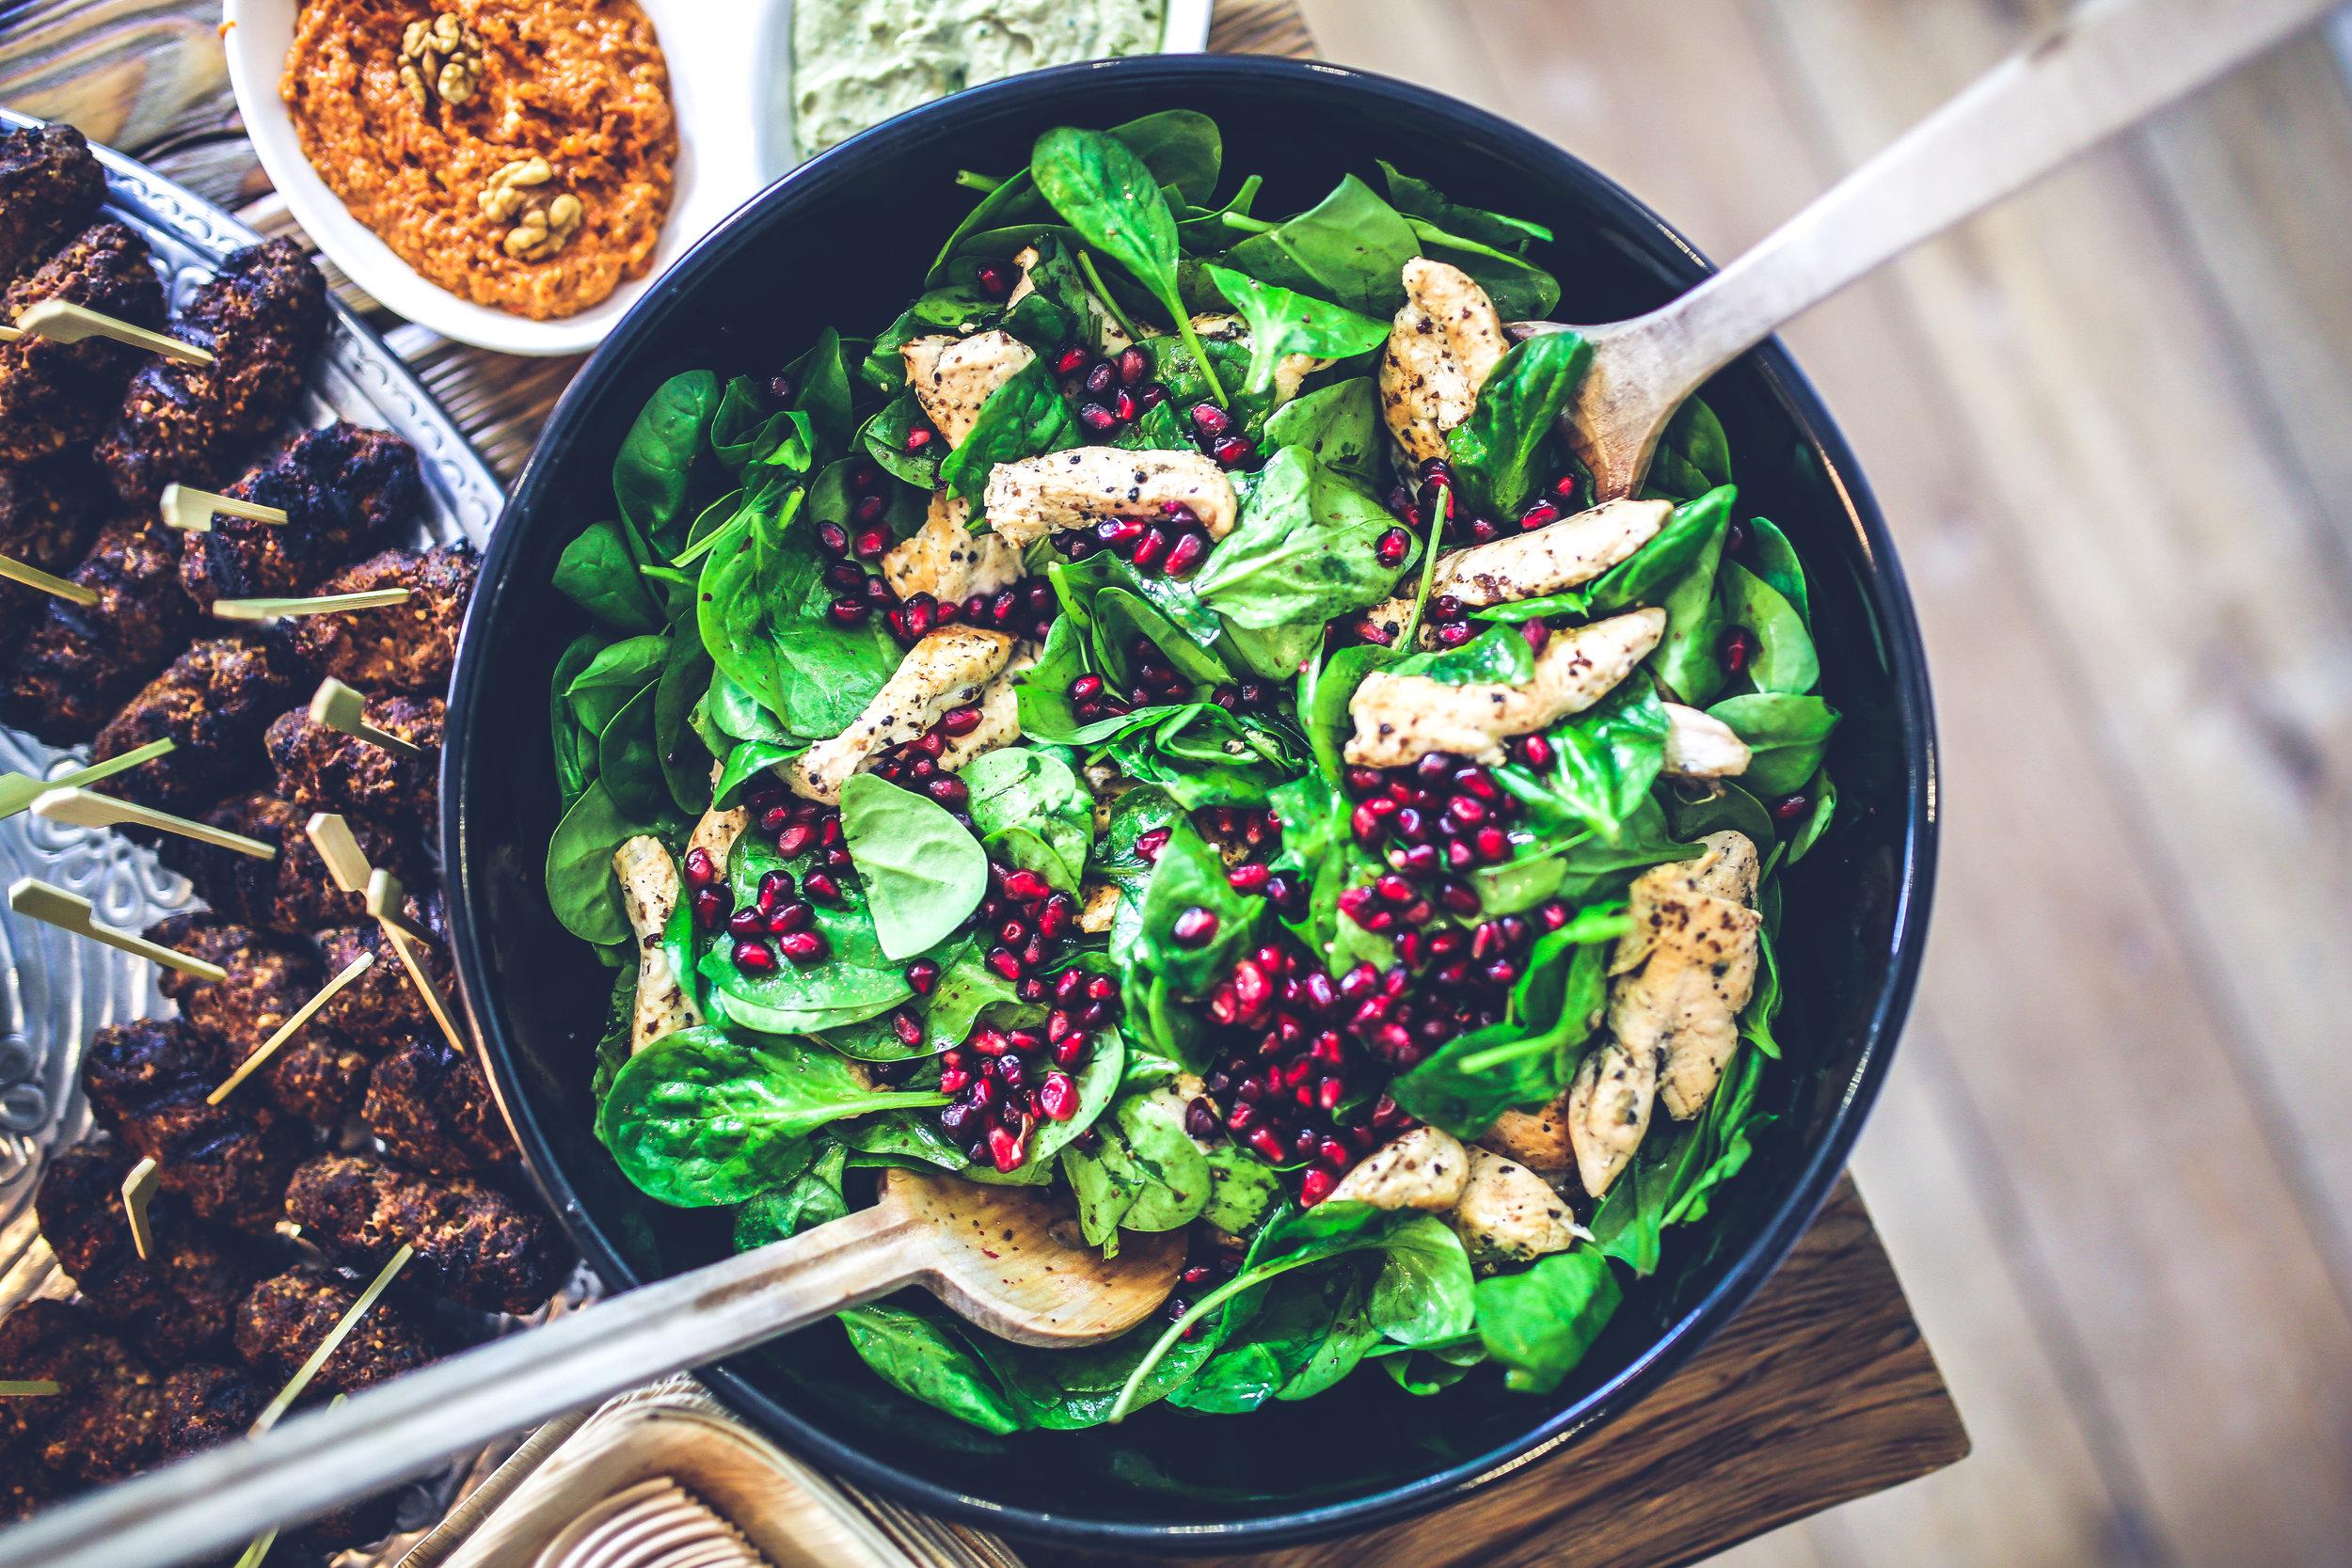 Photo by Kaboompics // Karolina from Pexels  https://www.pexels.com/photo/spinach-chicken-pomegranate-salad-5938/